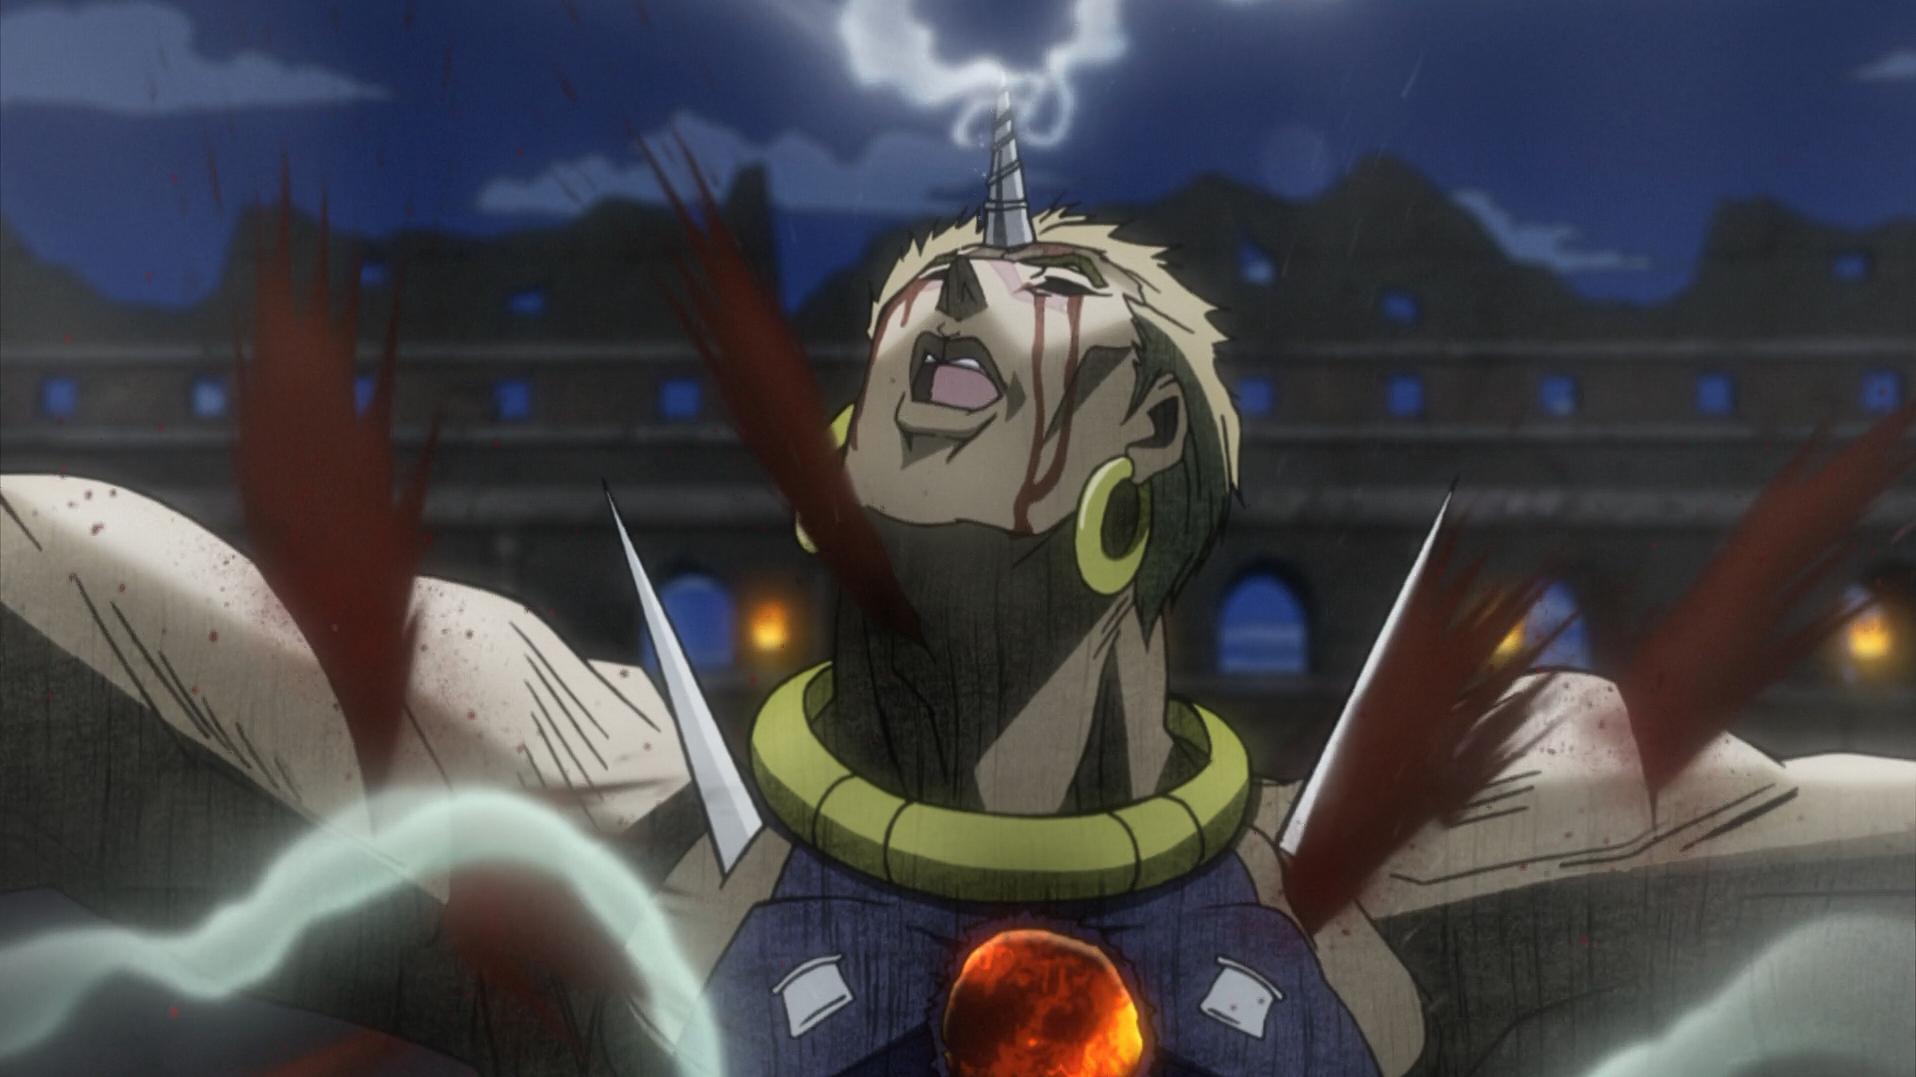 Featured image for Jojune Battle Tendency: Episode 14- The Warrior of Wind